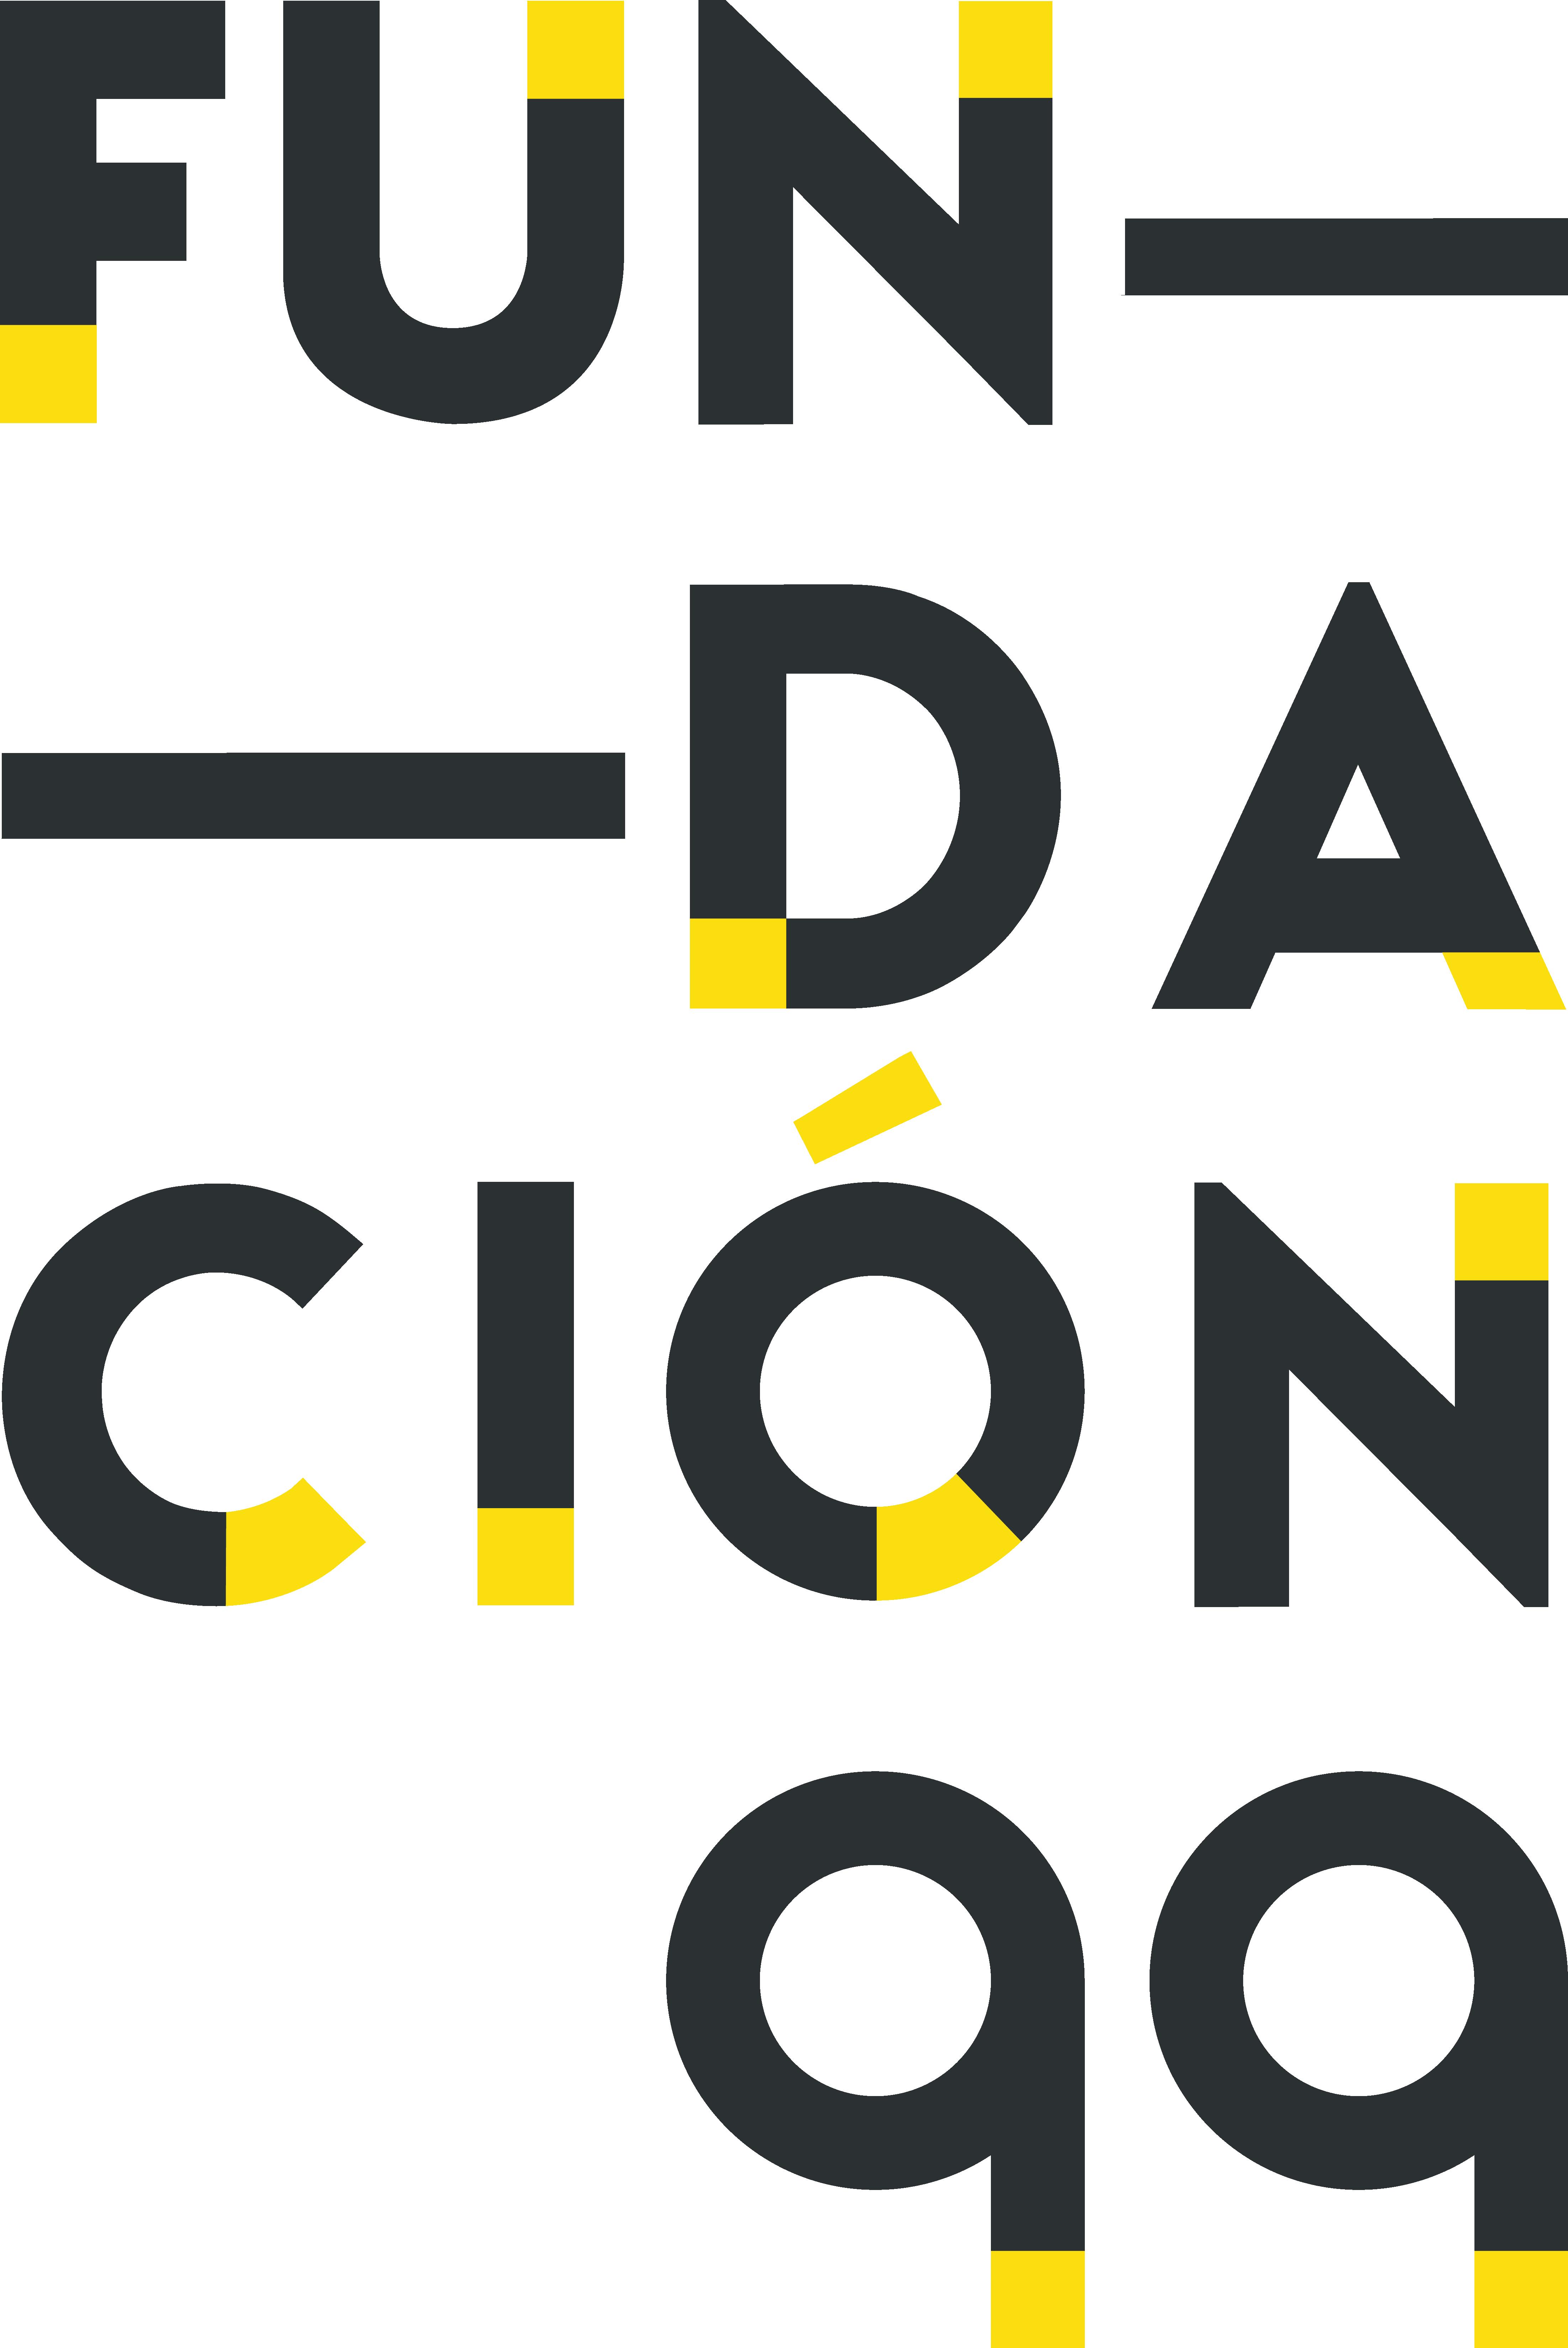 Empresas Desafio10x: FUNDACION 99